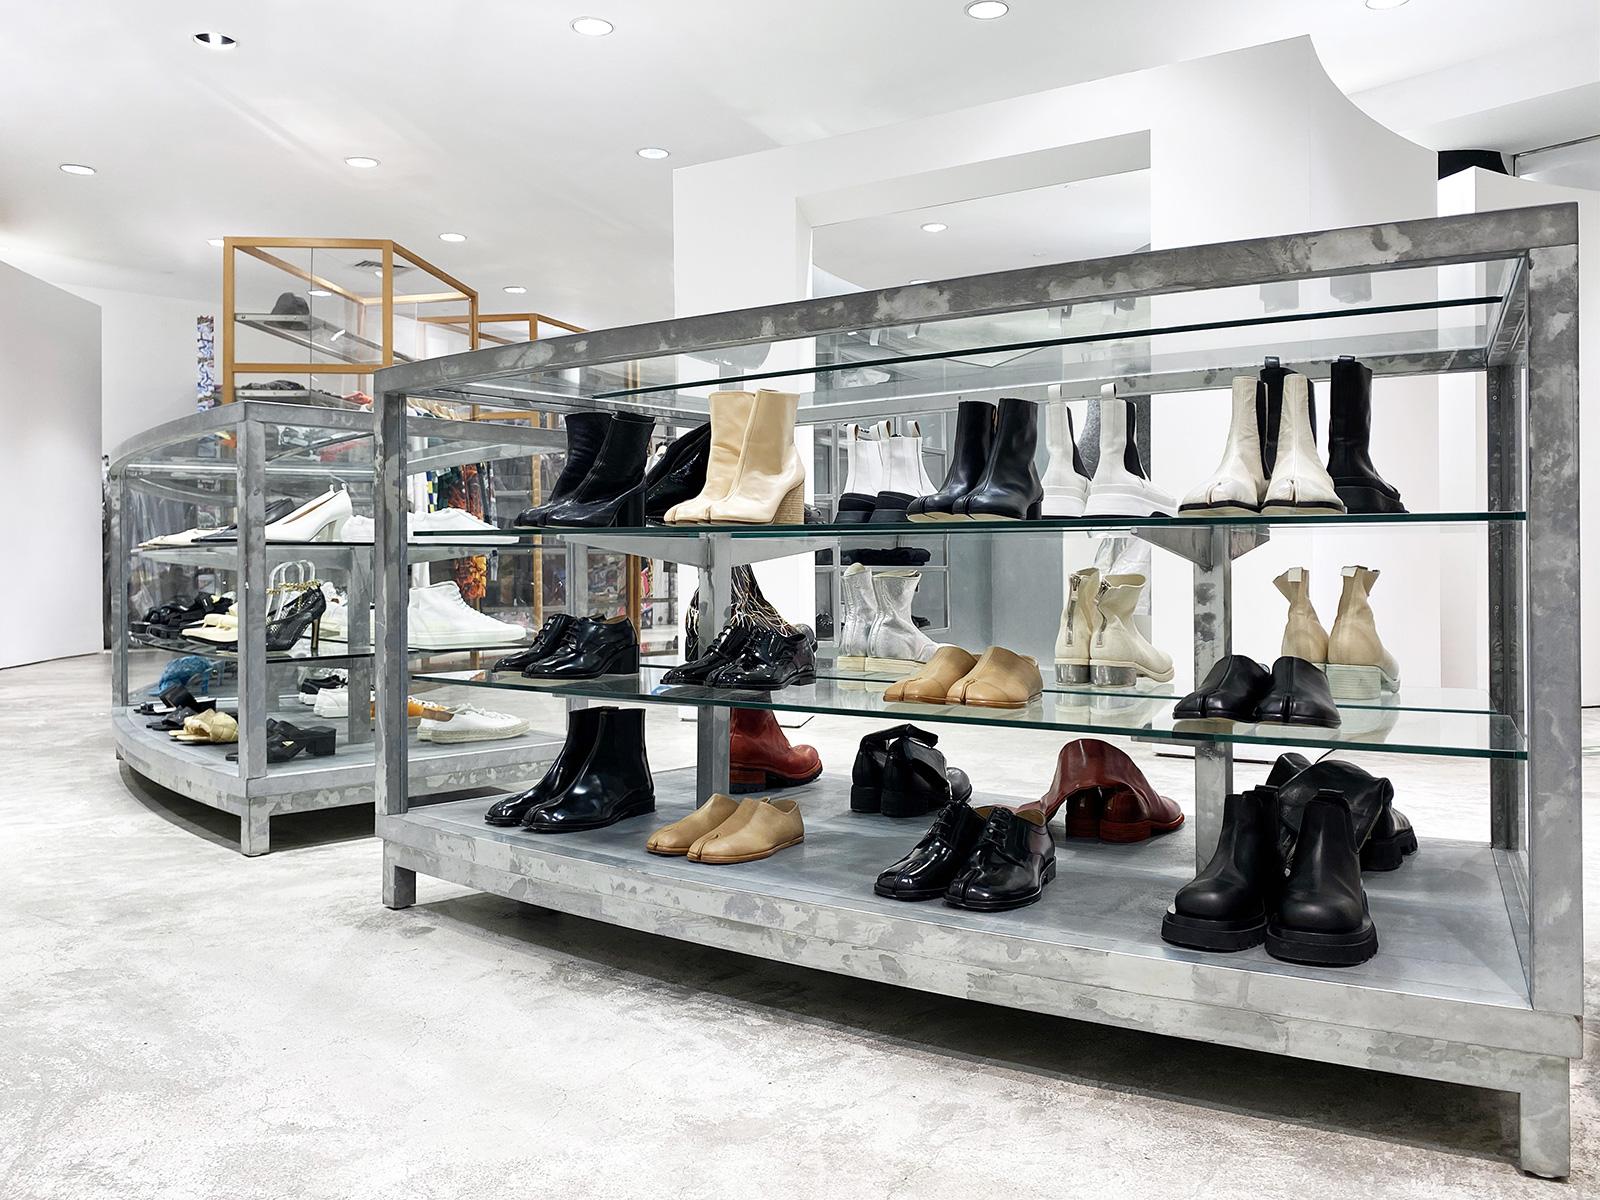 DSMB Shoe Space